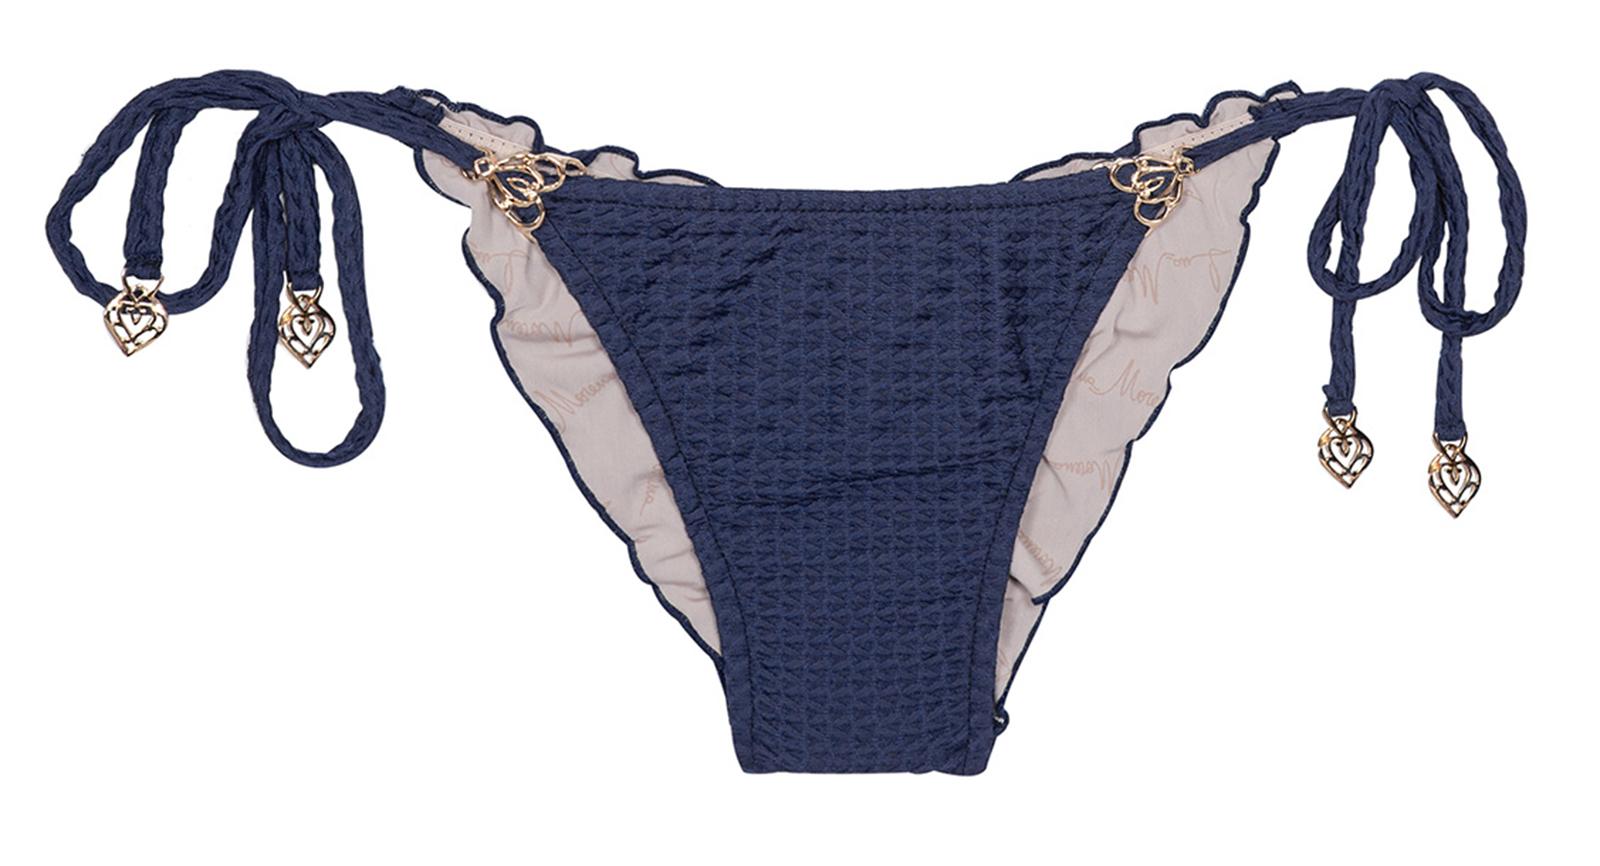 Scrunch-bikini-höschen, Marineblau & Texturiert - Calcinha Mini Arabesco Blu